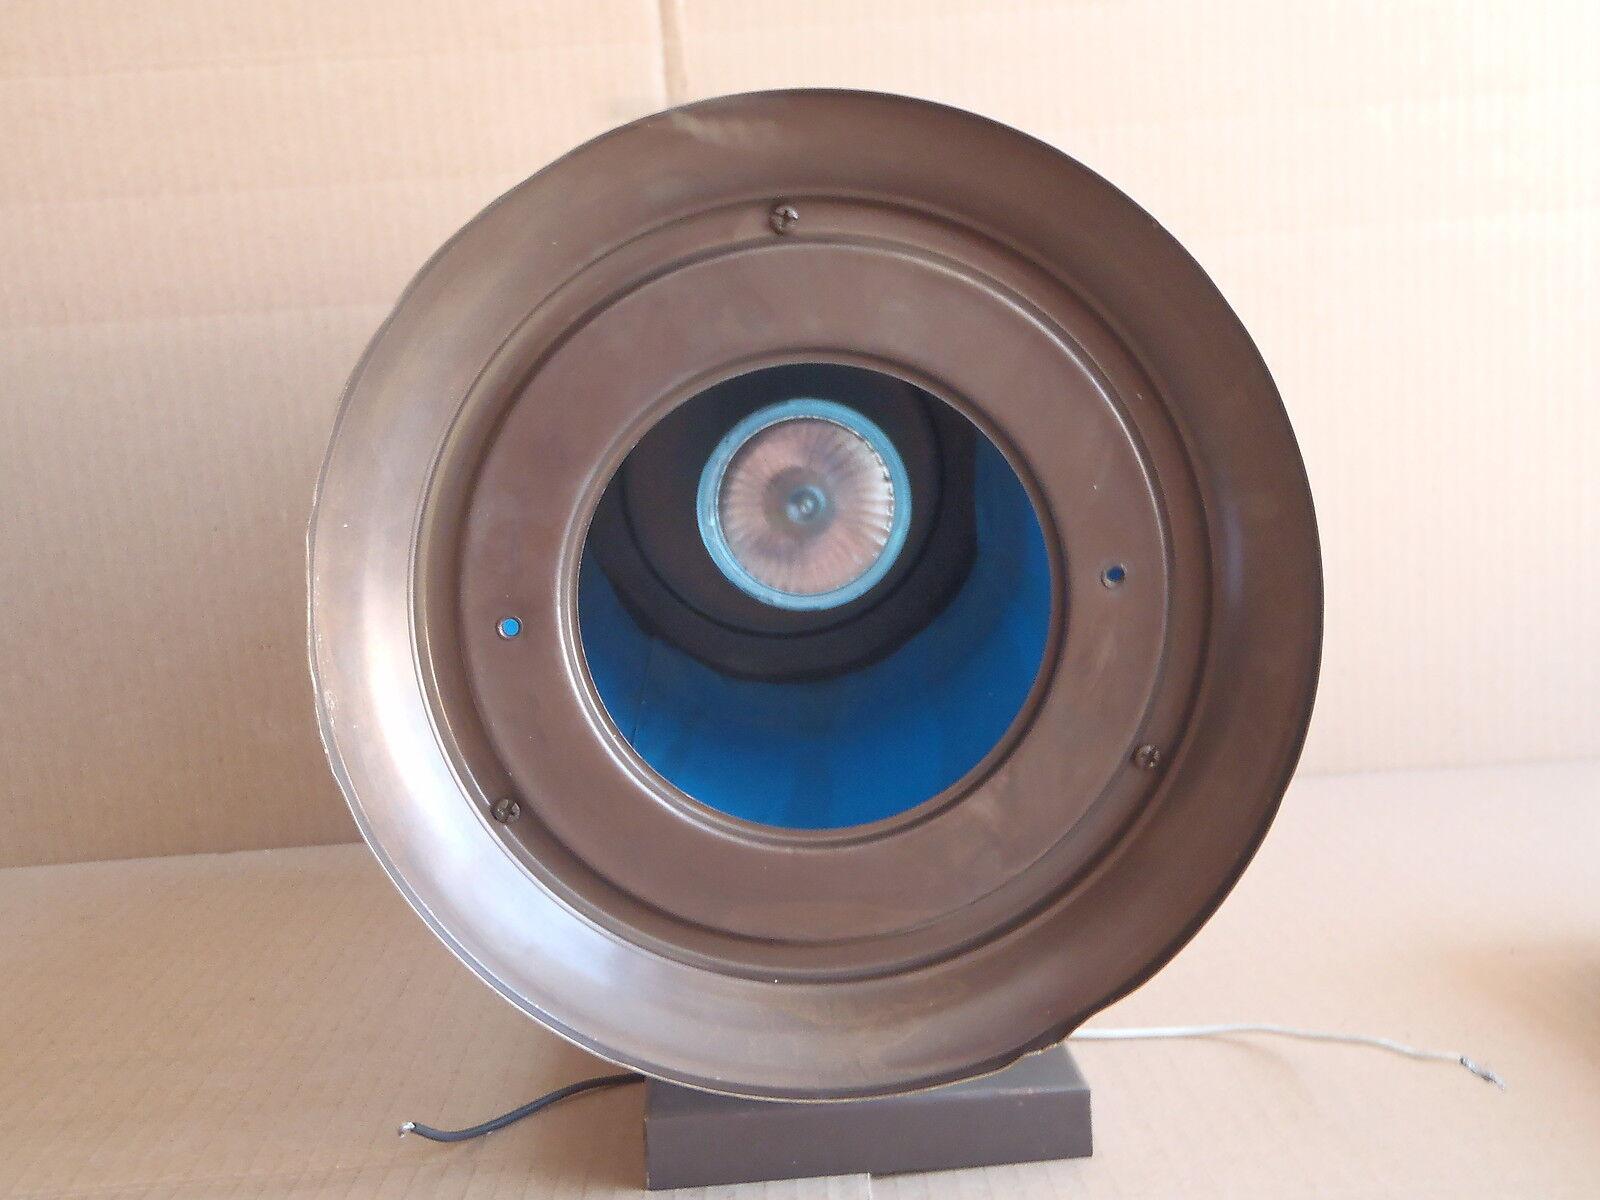 Dolan Dolan Dolan Lighting 0408020 Porch Light Lantern Modern Fixture 20x11x9 120v 24b8e1